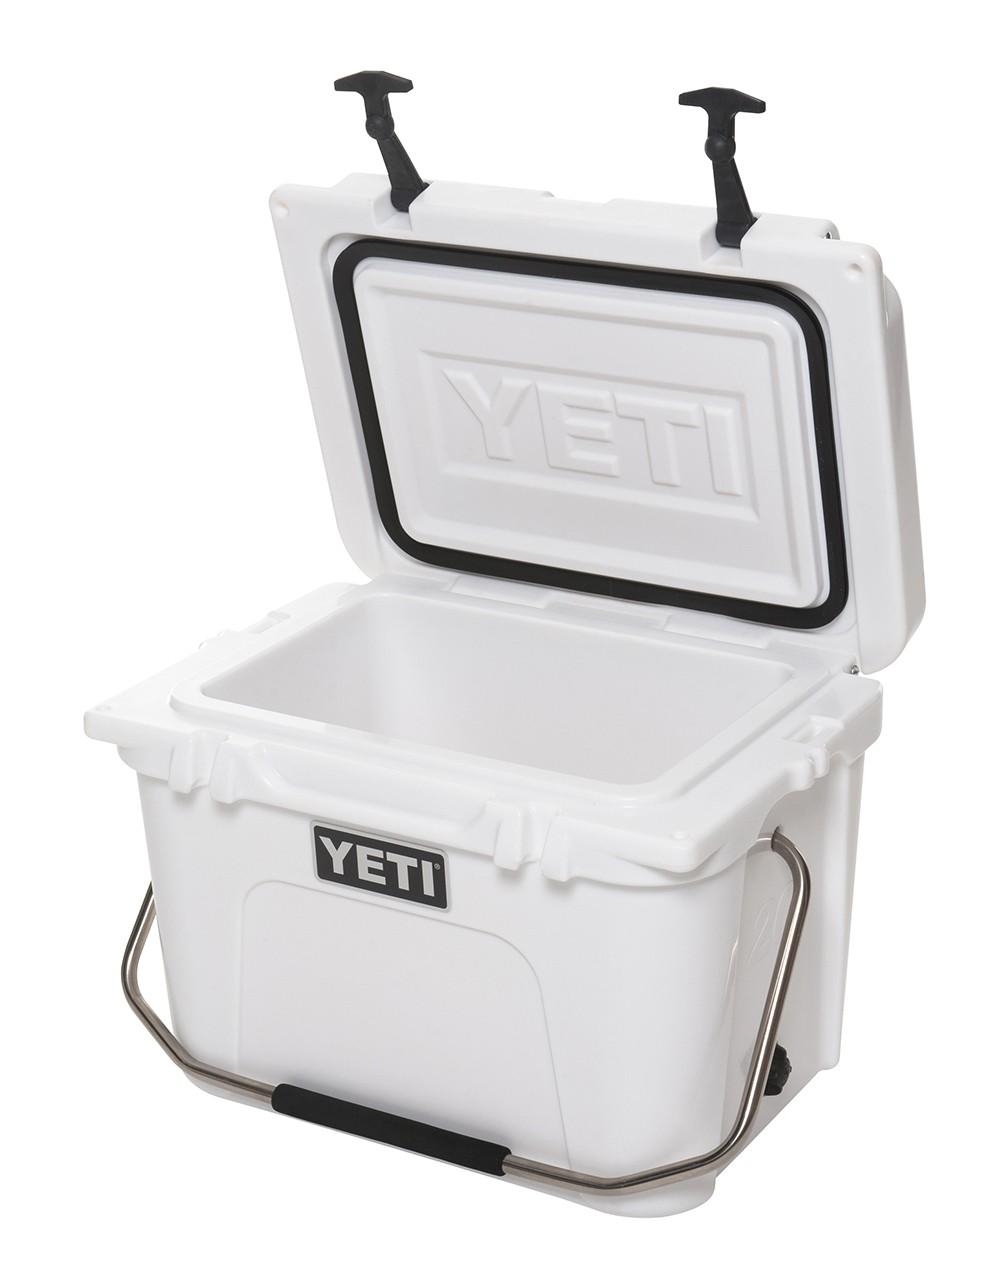 Yeti Roadie 20 Cooler open